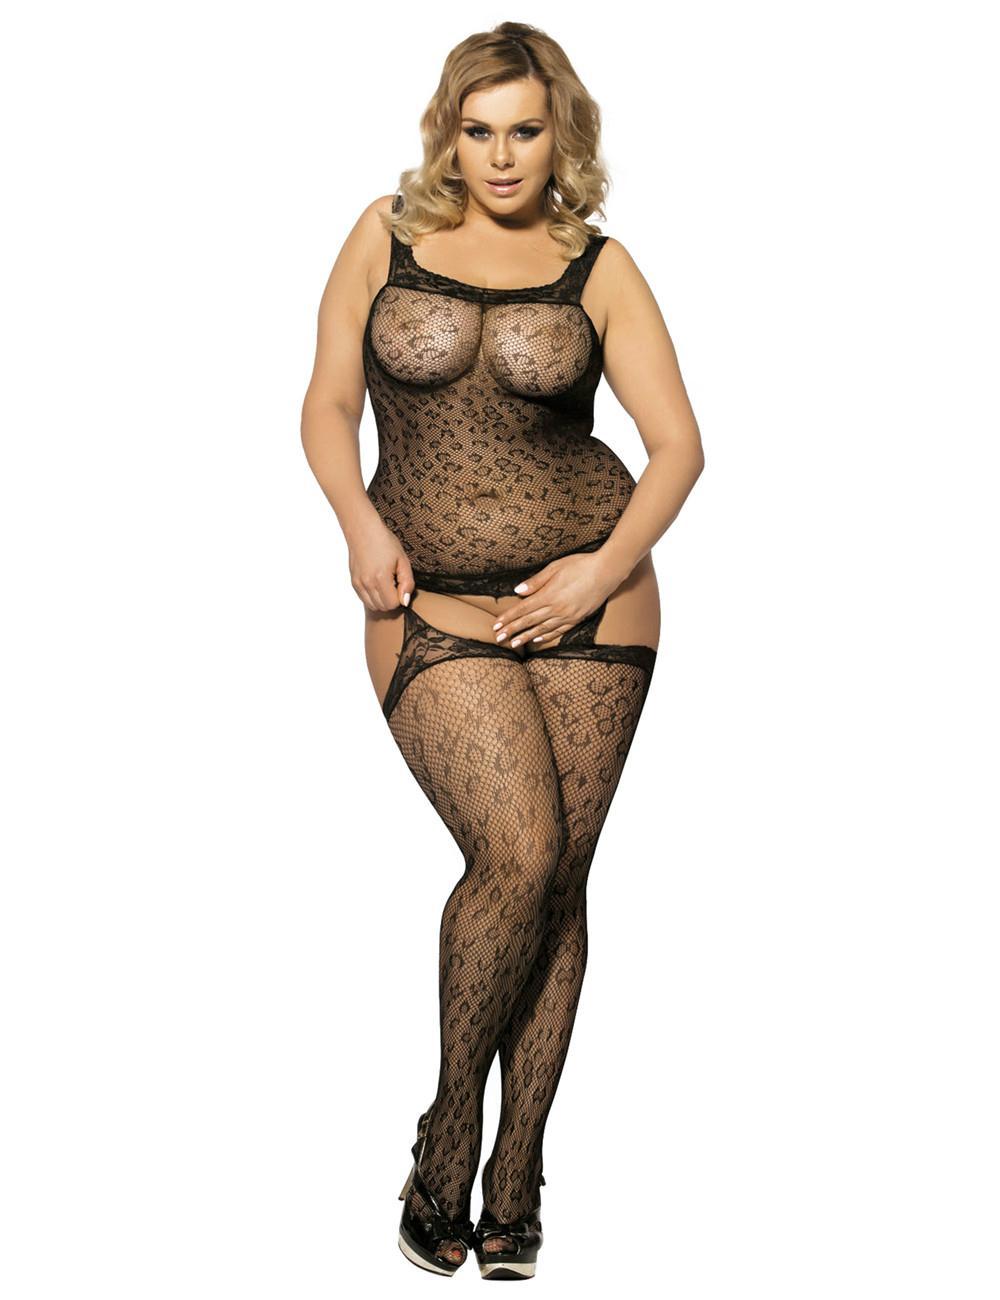 hot women nude black bodystocking - china - trading company - product